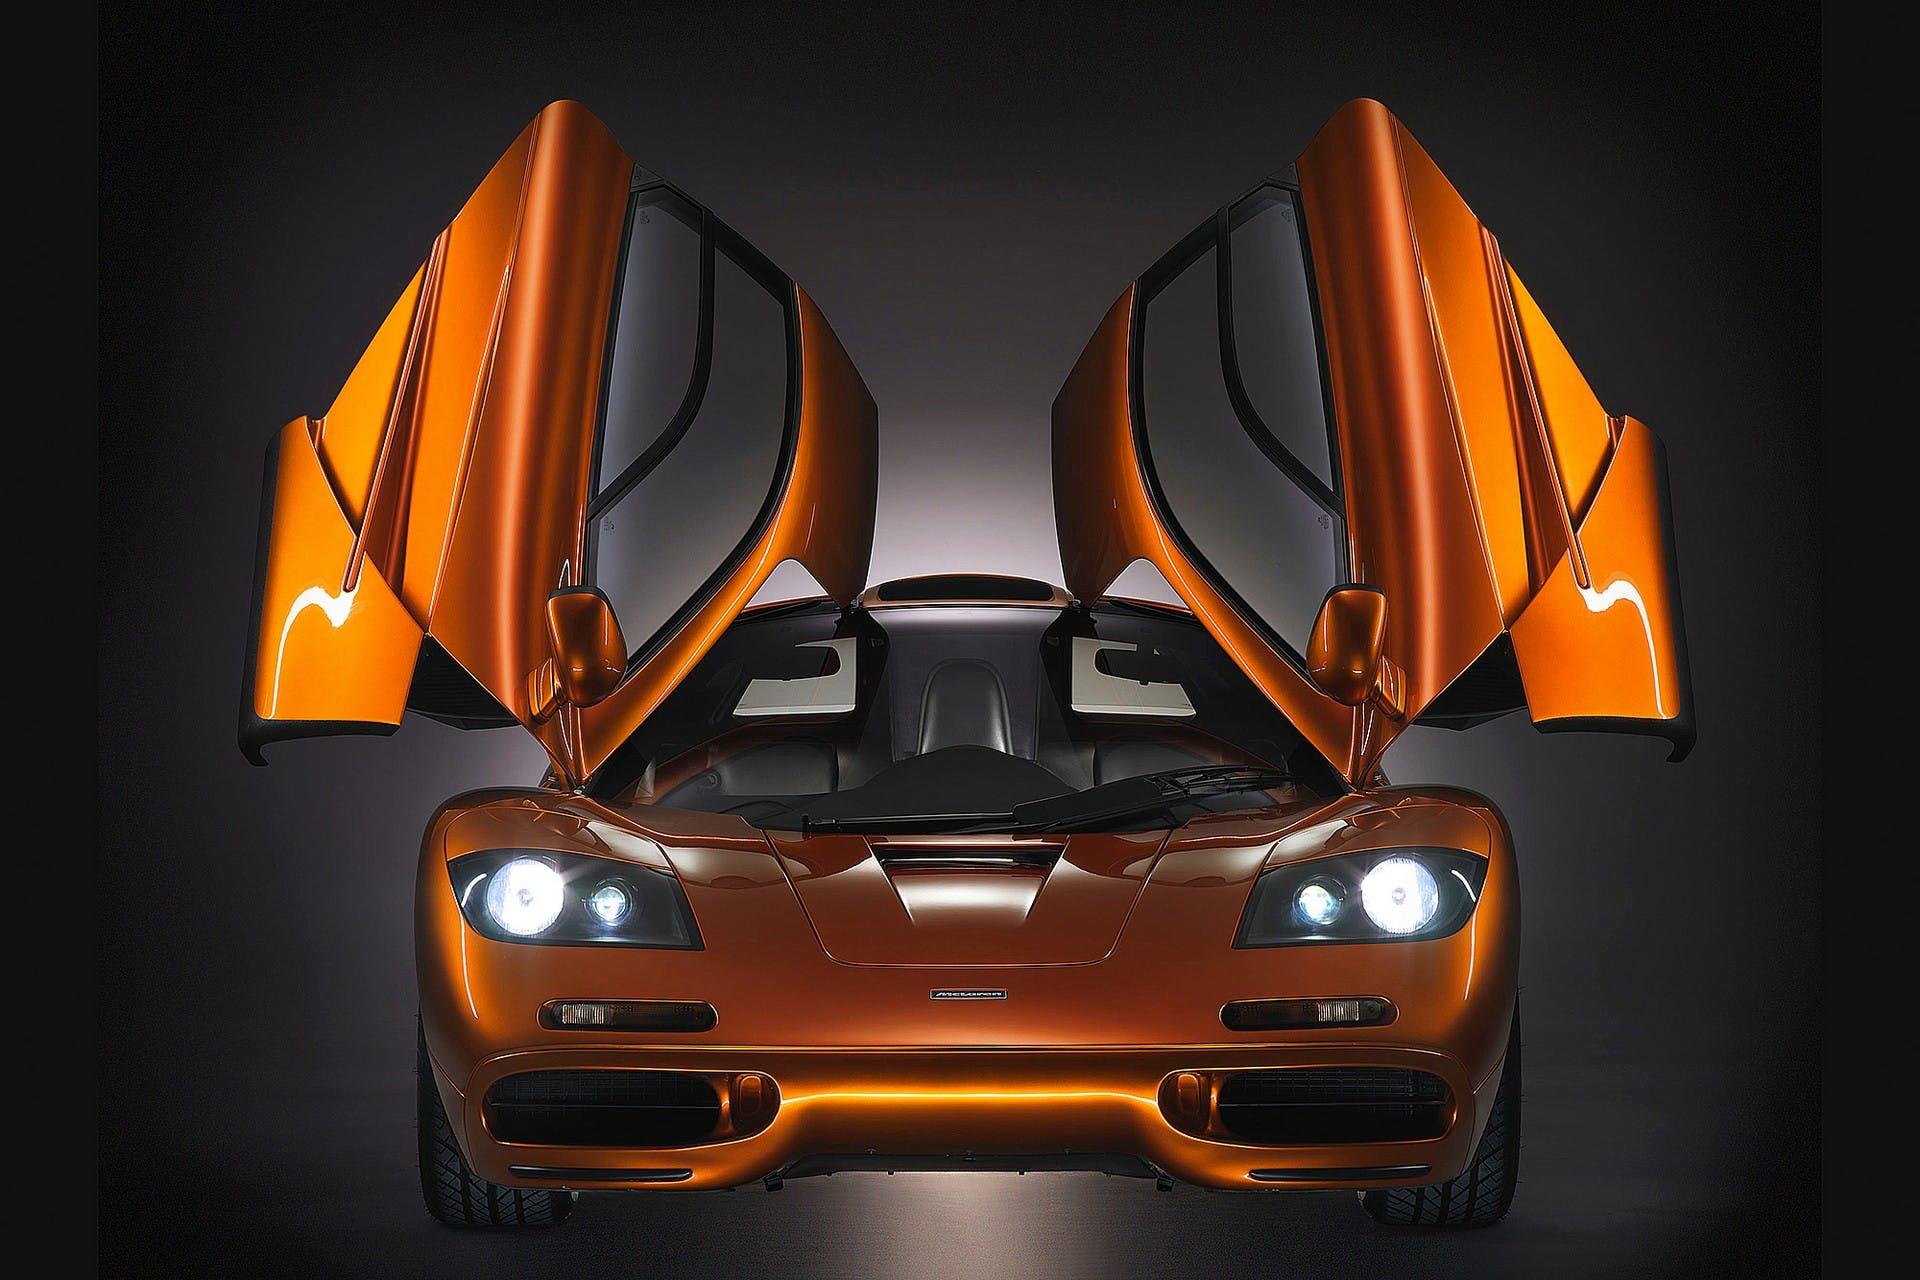 McLaren F1 statica